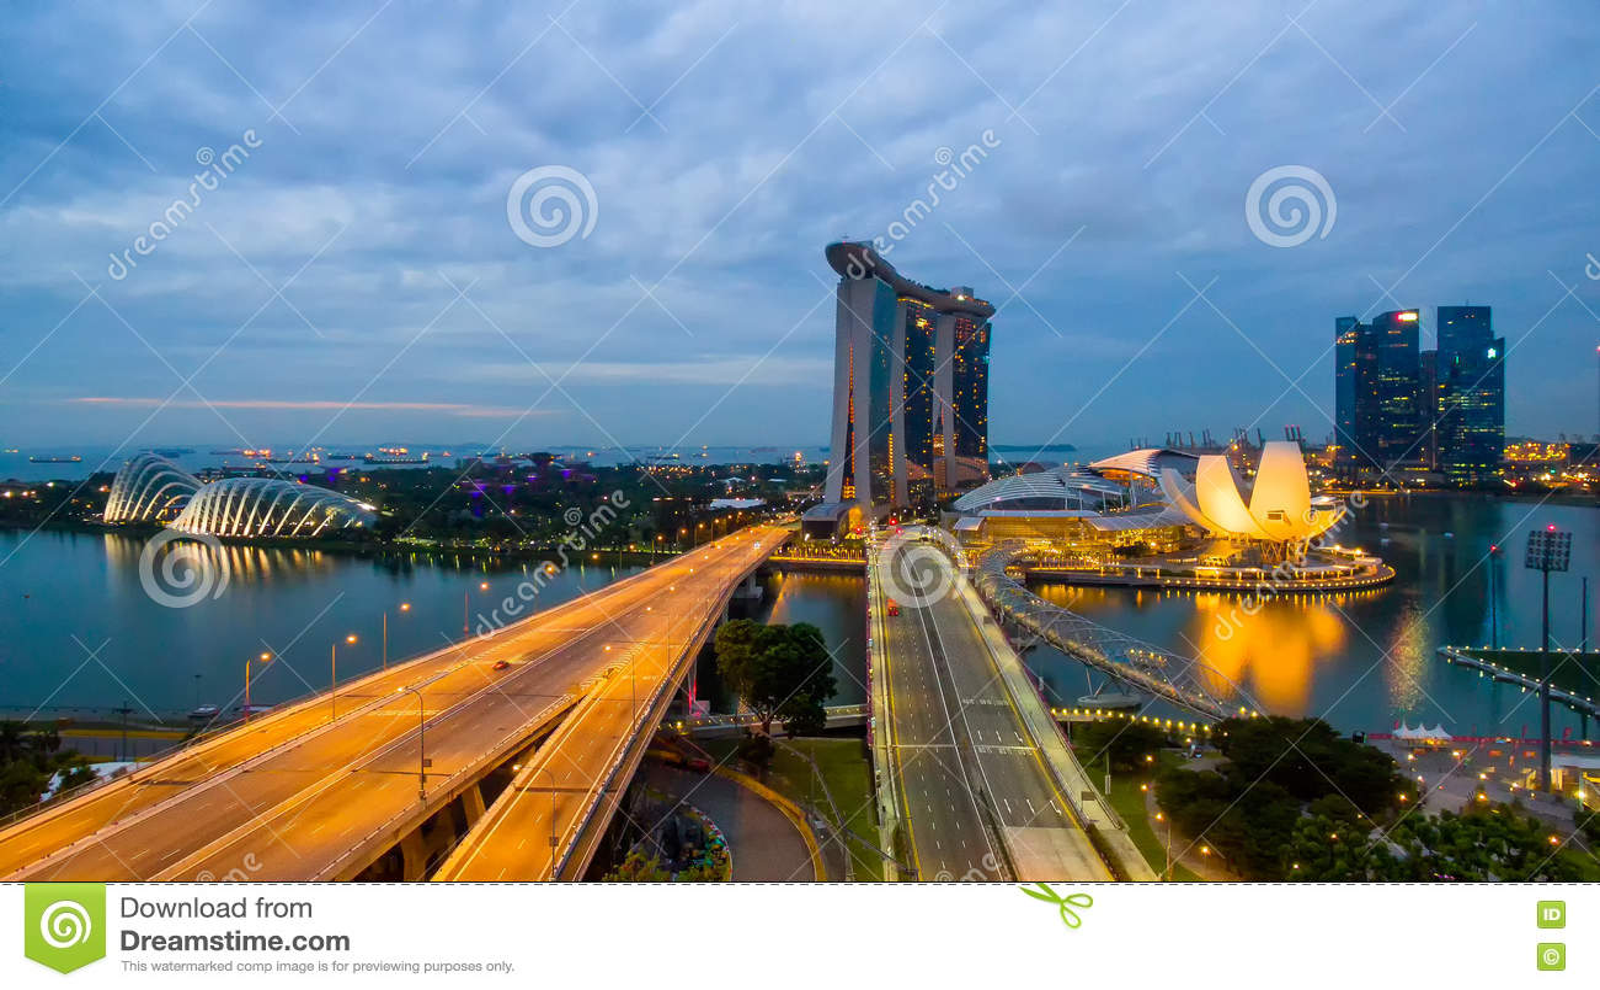 Singapore,Singapore – July 2016 : Aerial view of Singapore city skyline in sunrise or sunset at Marina Bay, Singapore